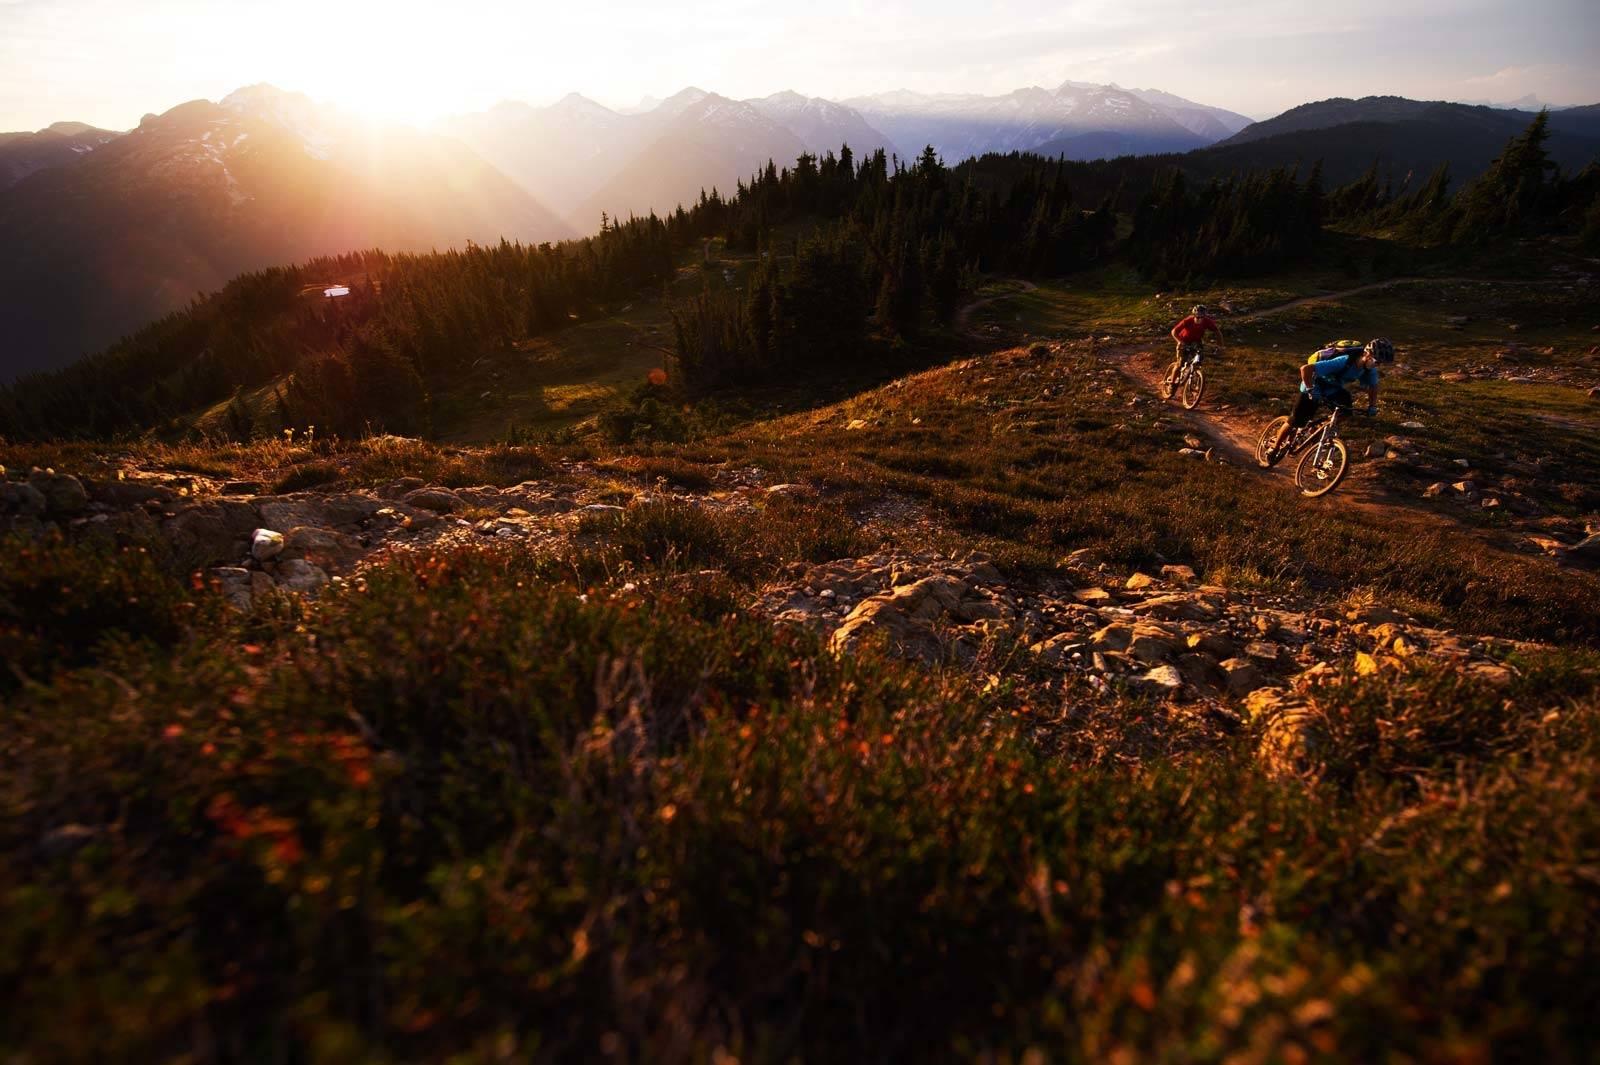 Stisykling-guide-British-Columbia-Revelstoke-1